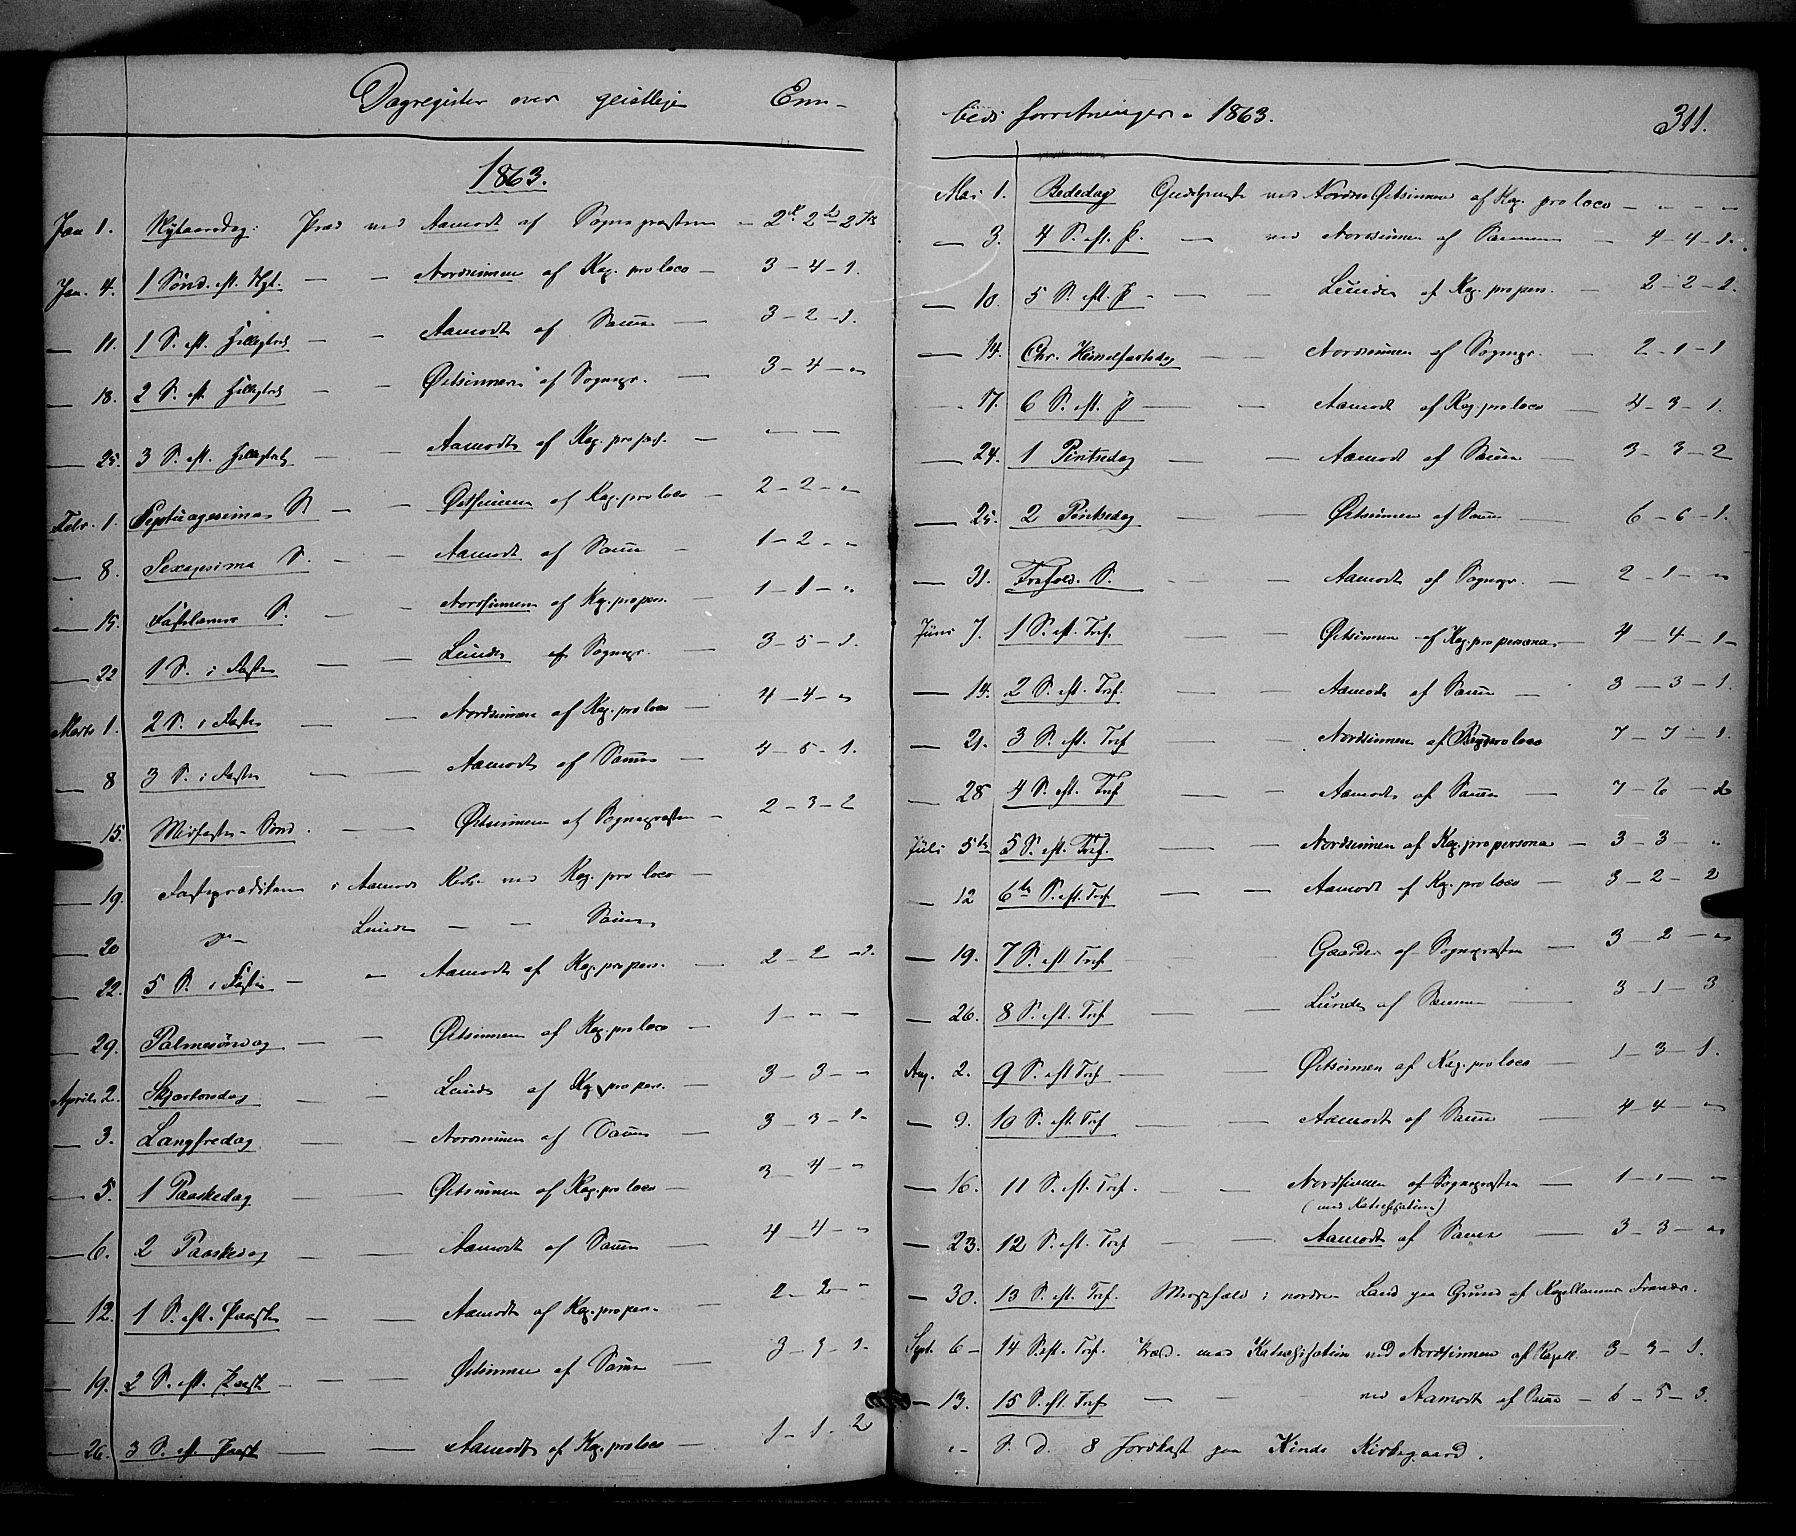 SAH, Nordre Land prestekontor, Ministerialbok nr. 1, 1860-1871, s. 311